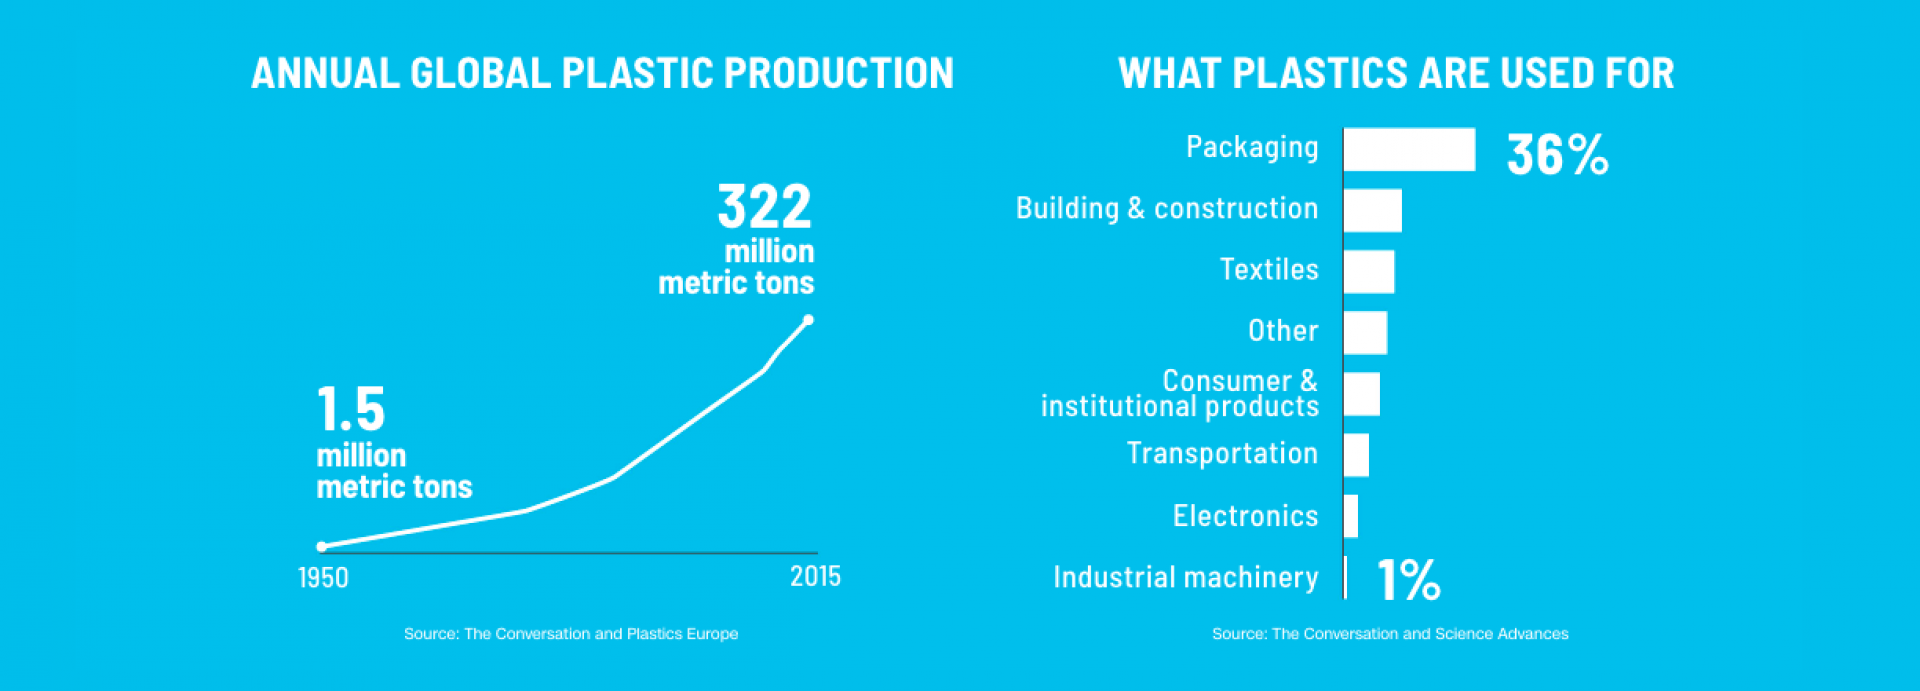 Plastic production and use statistics